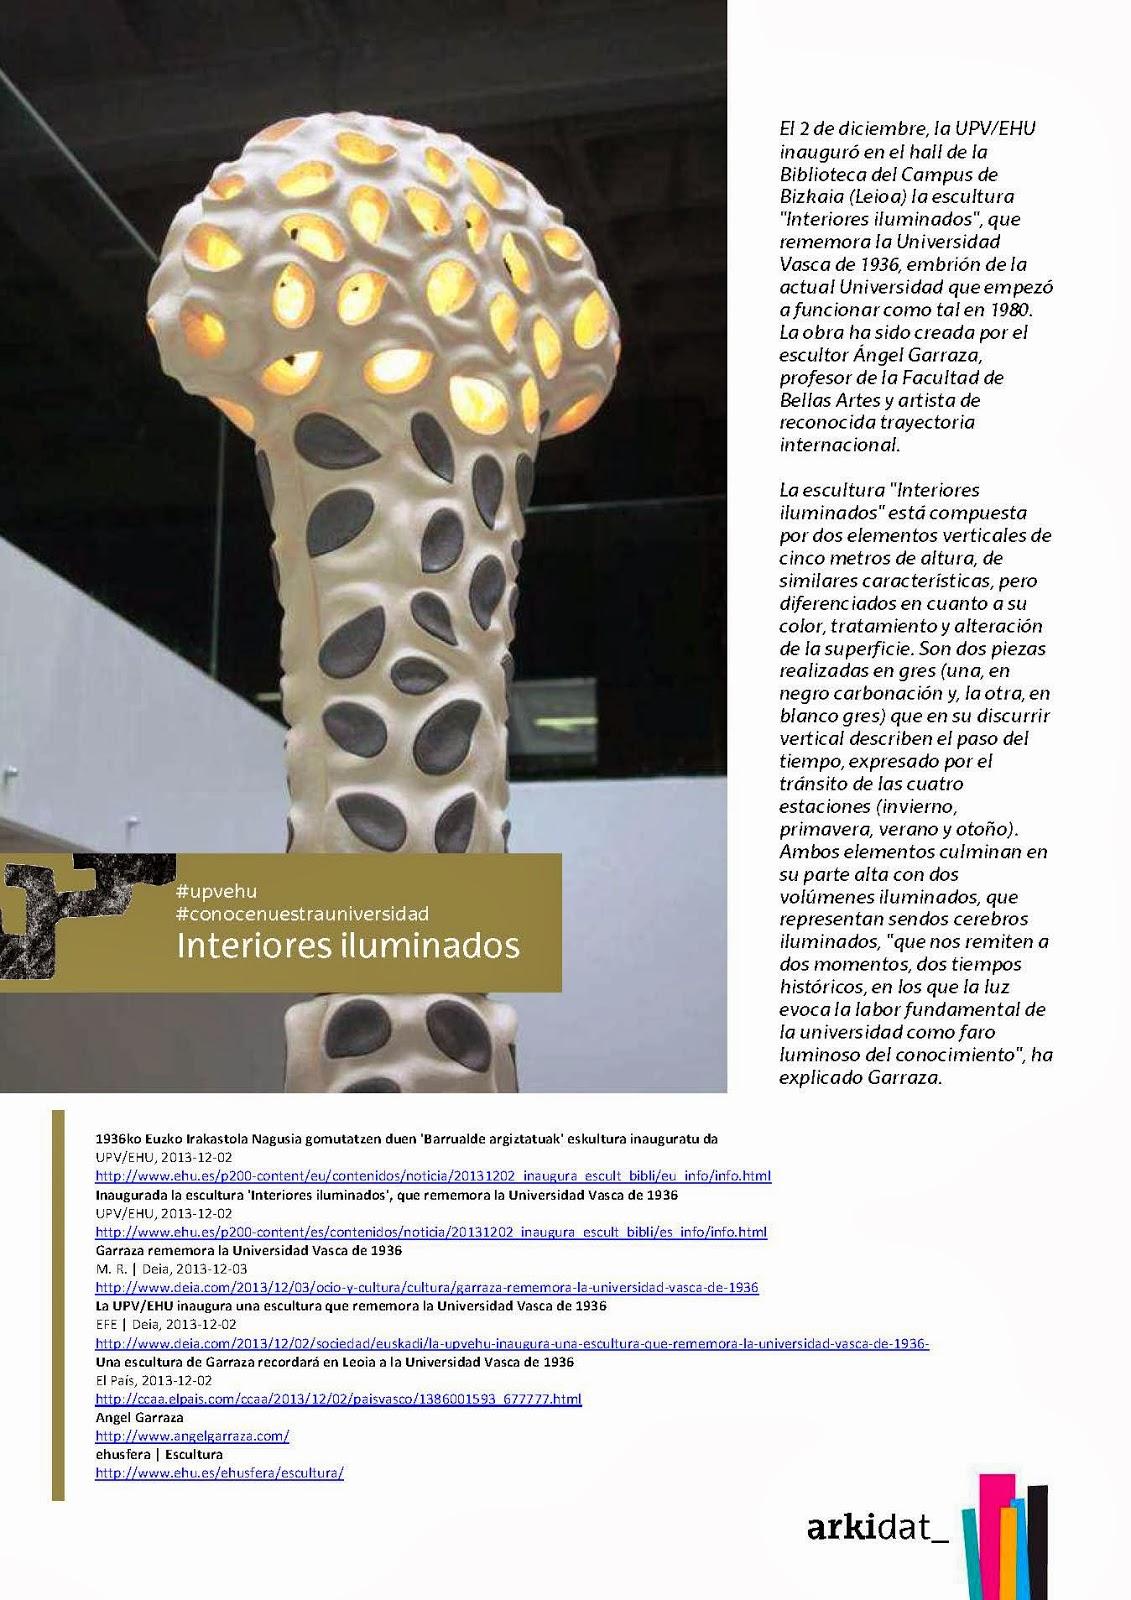 20131204-InterioresIluminados-ES-TX